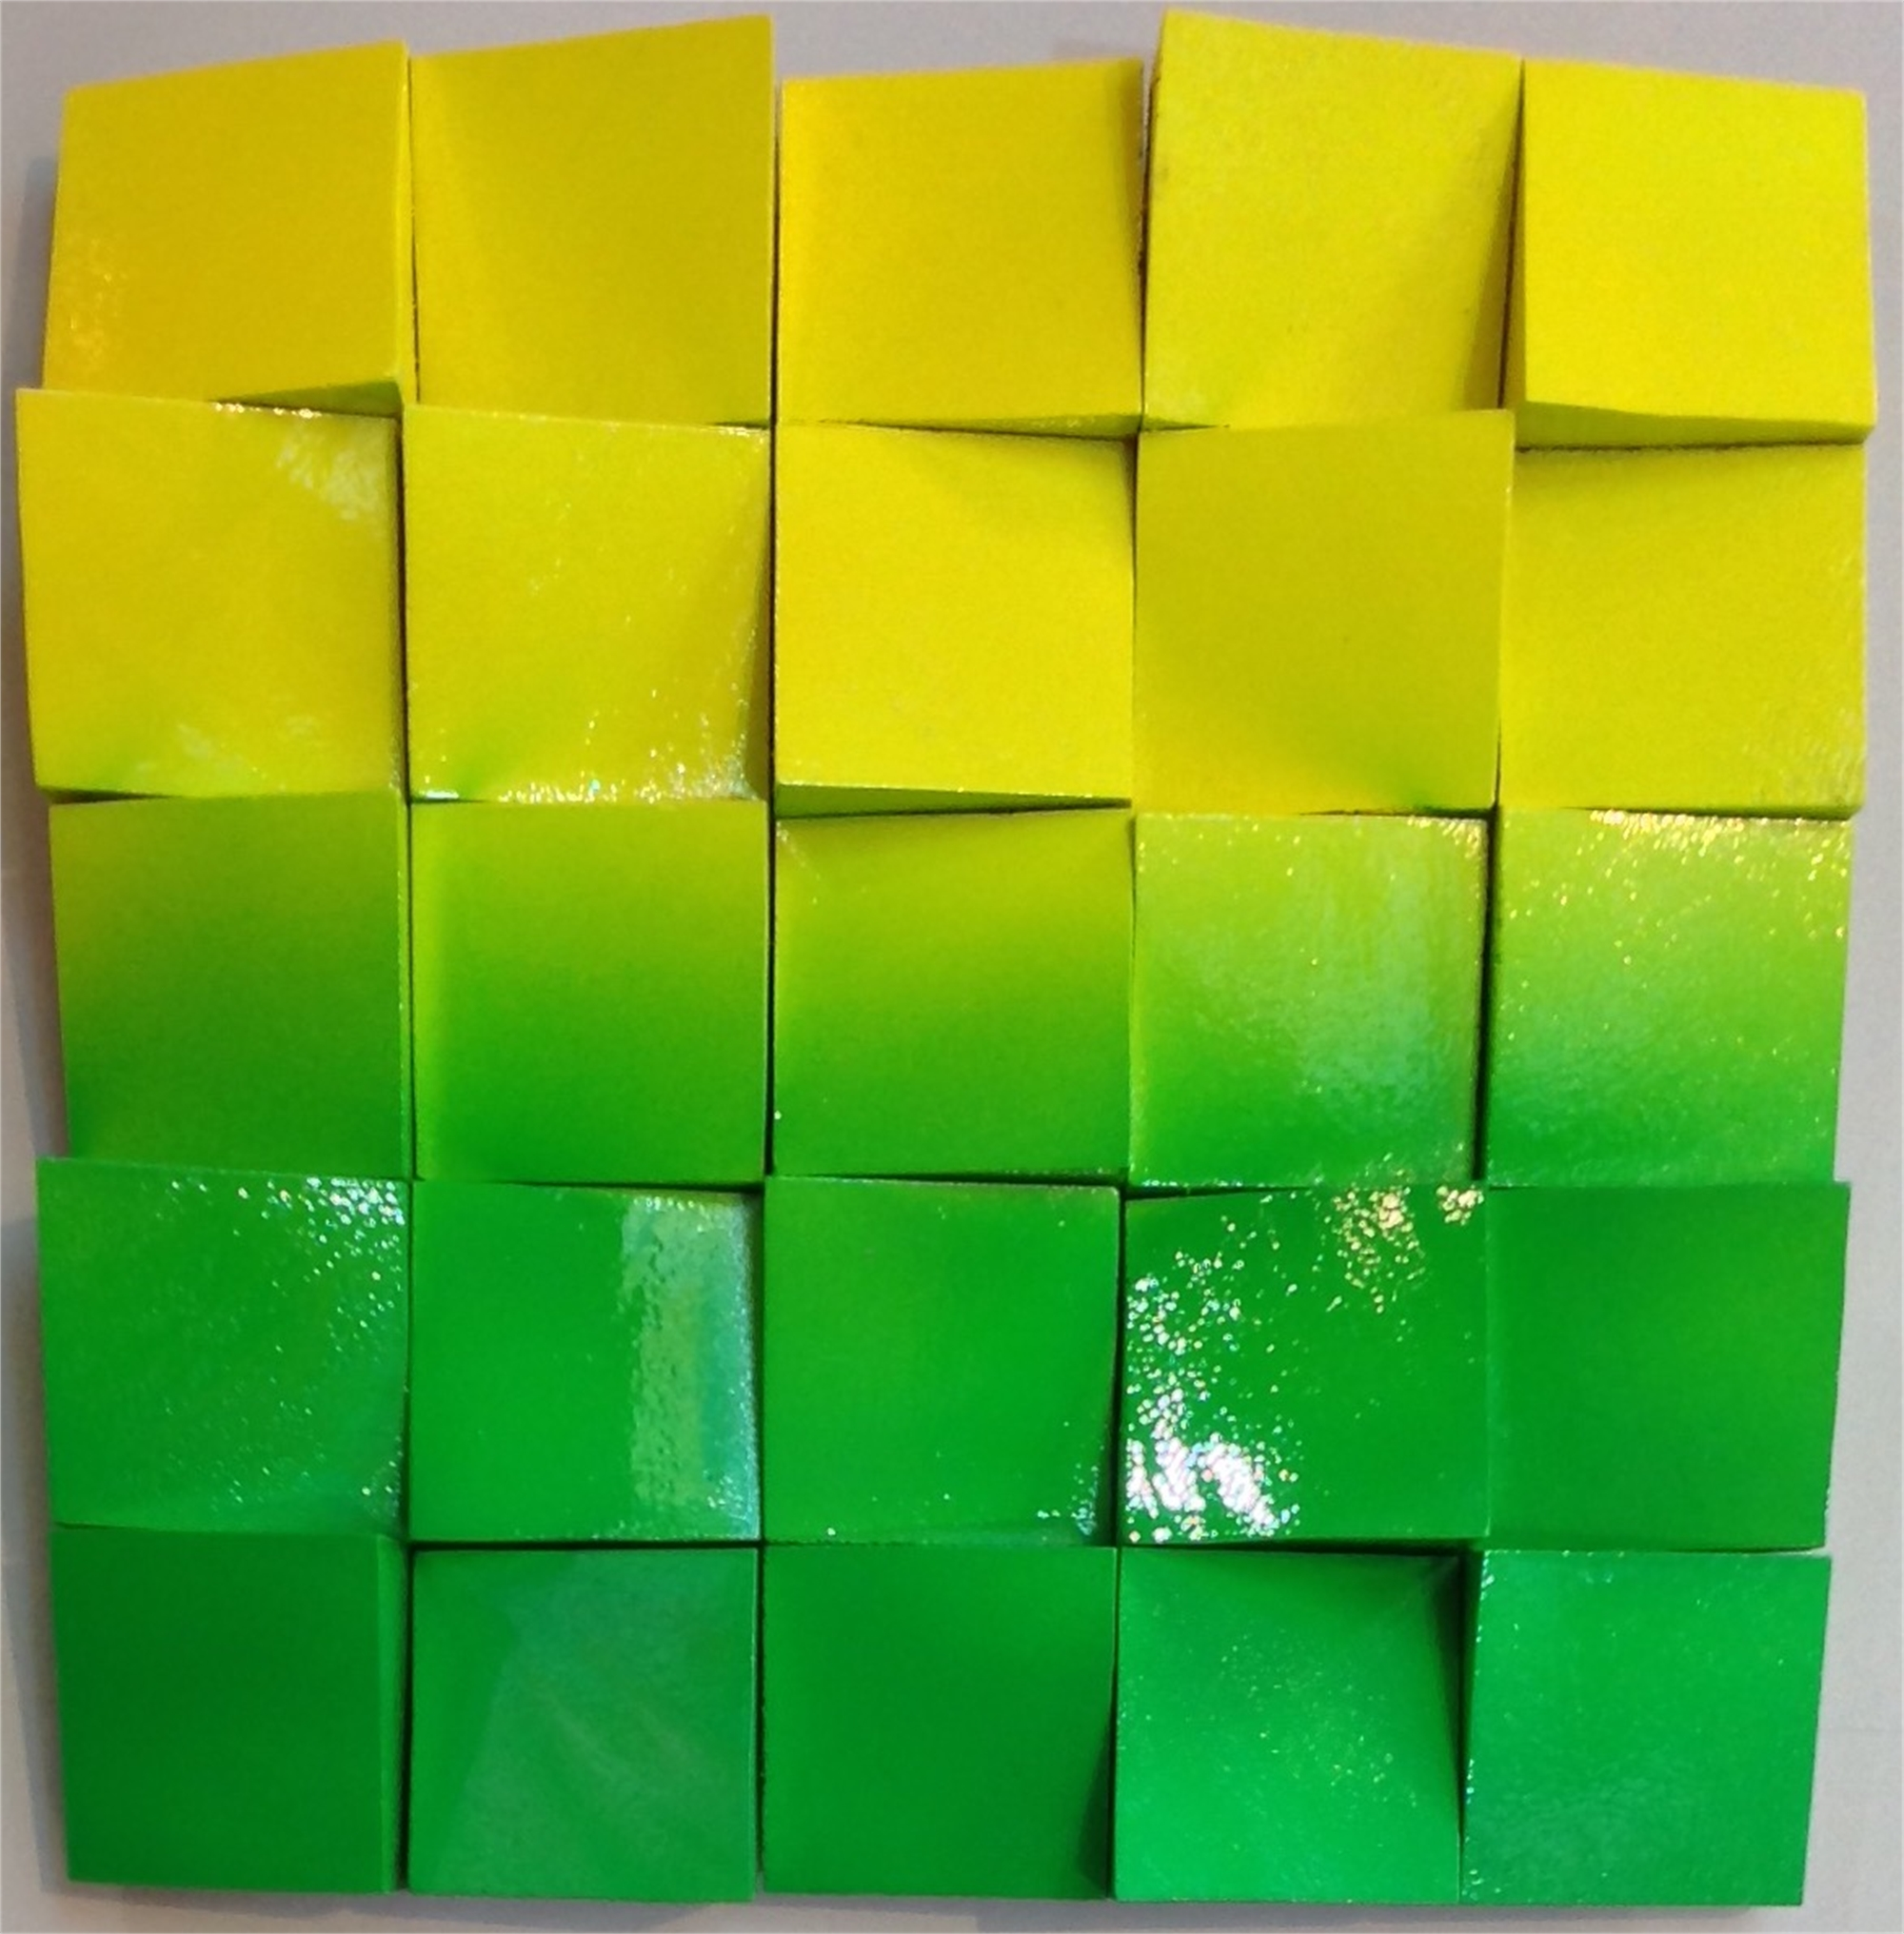 Neon Waves Green/Yellow Ombre by Efi Mashiah